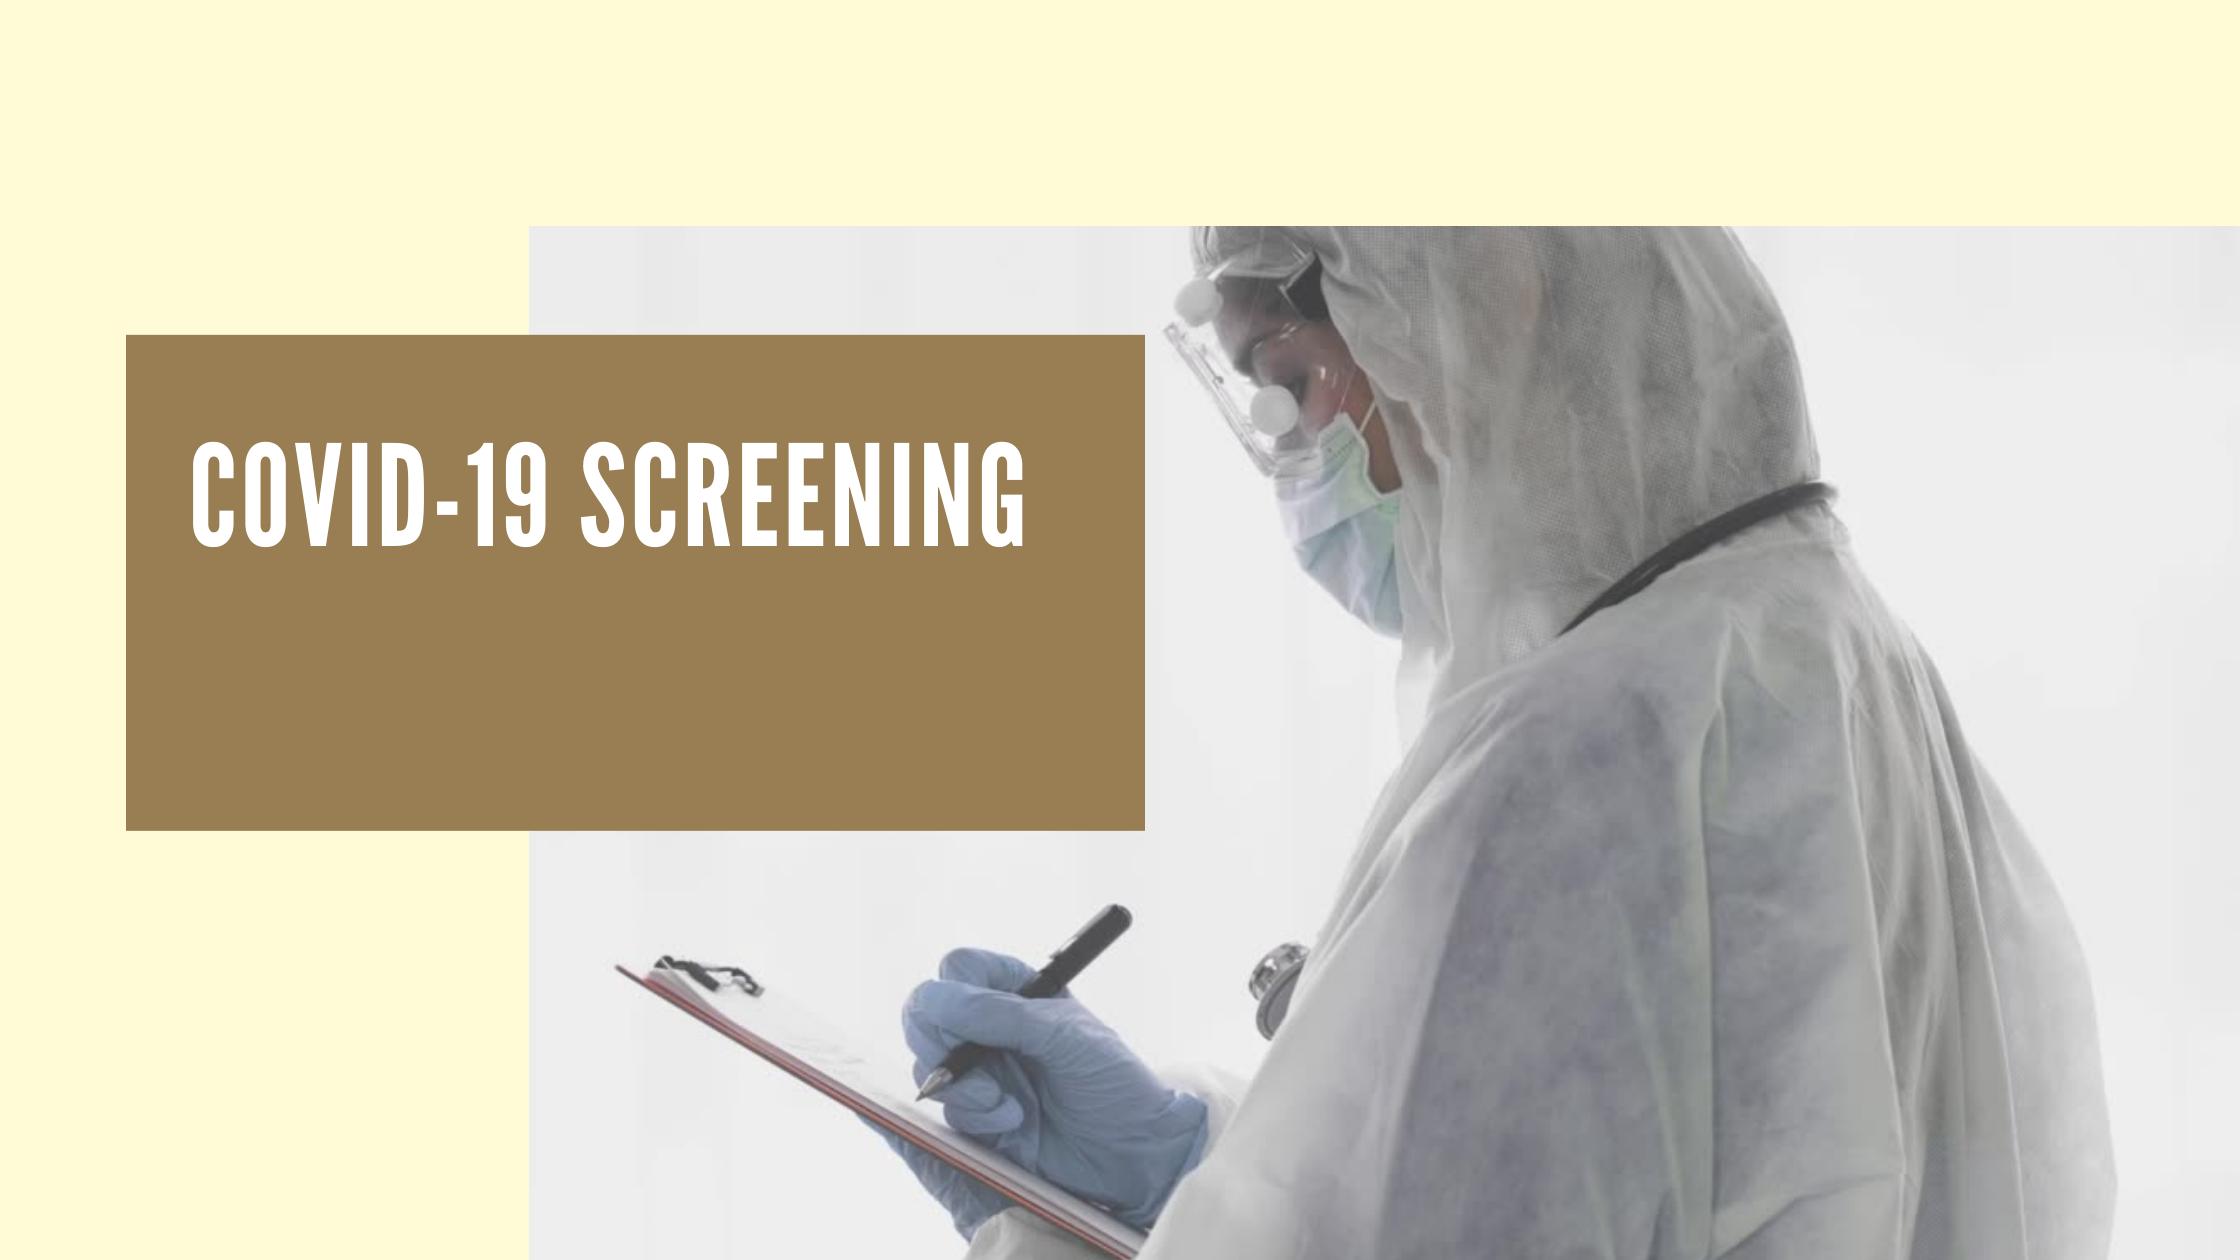 COVID-19-Screening-Andorra-hospital-sela